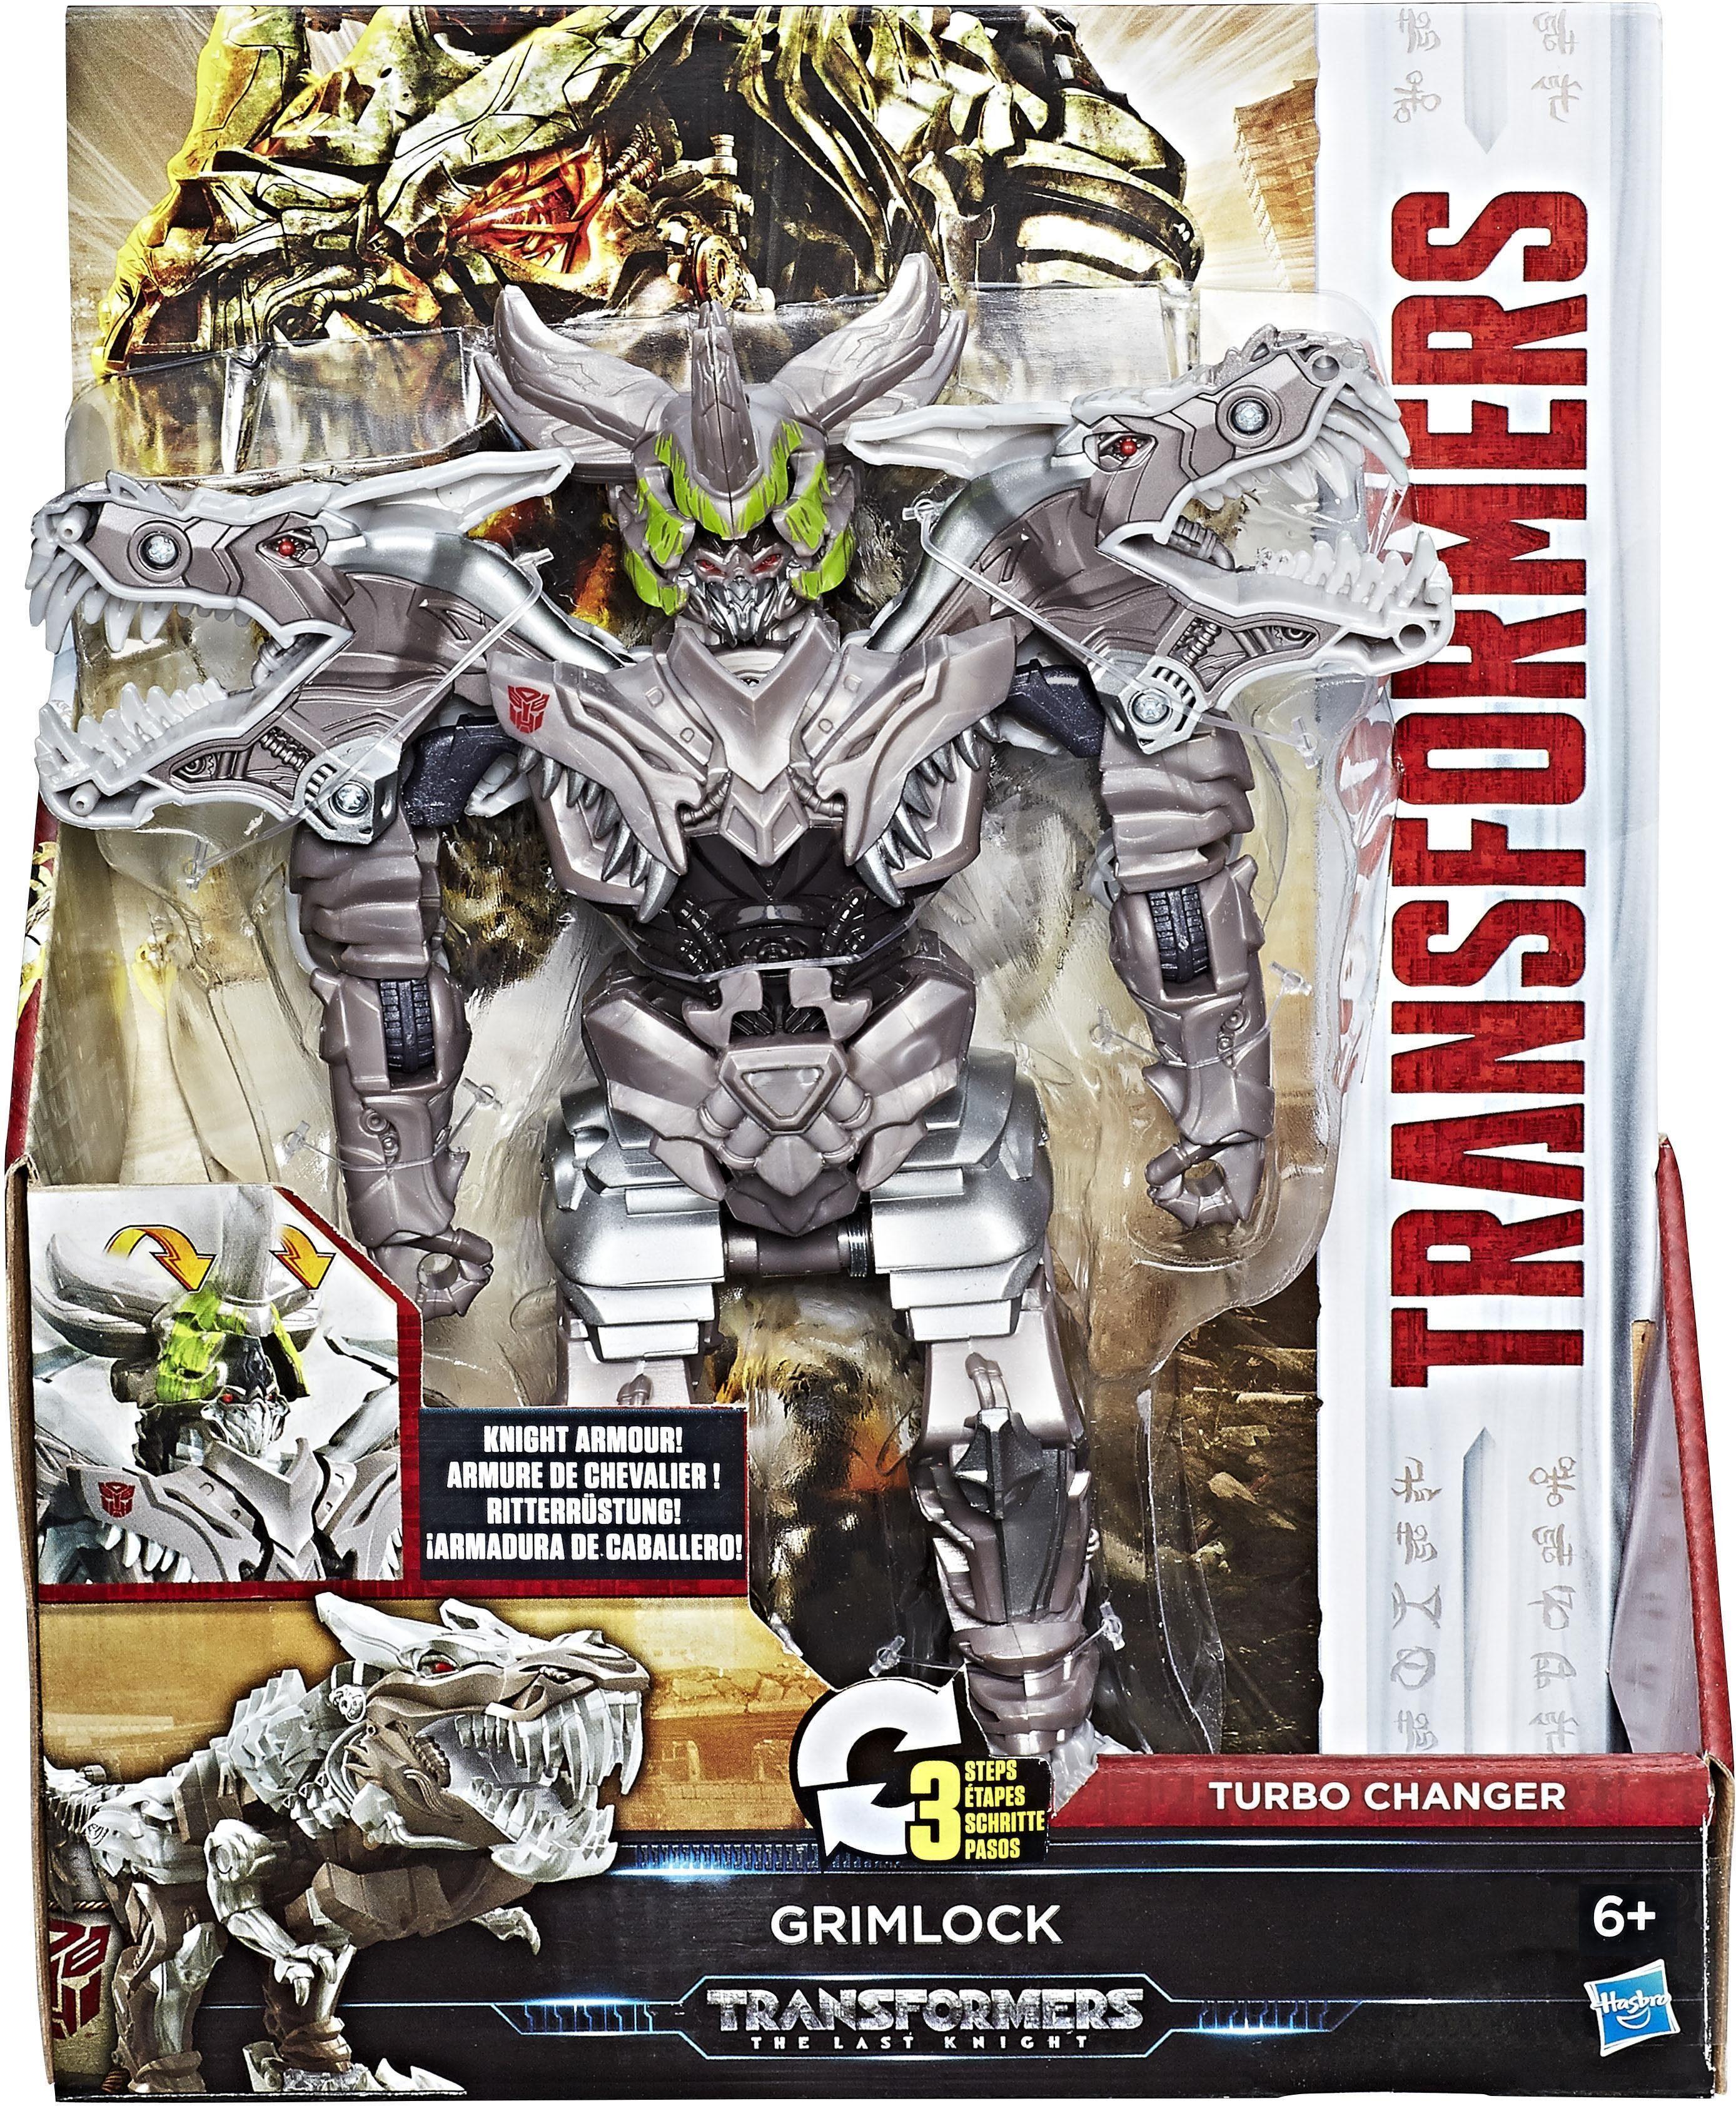 Hasbro Spielfigur, »Transformers 5, KnightArmor Turbo Changer Grimlock«